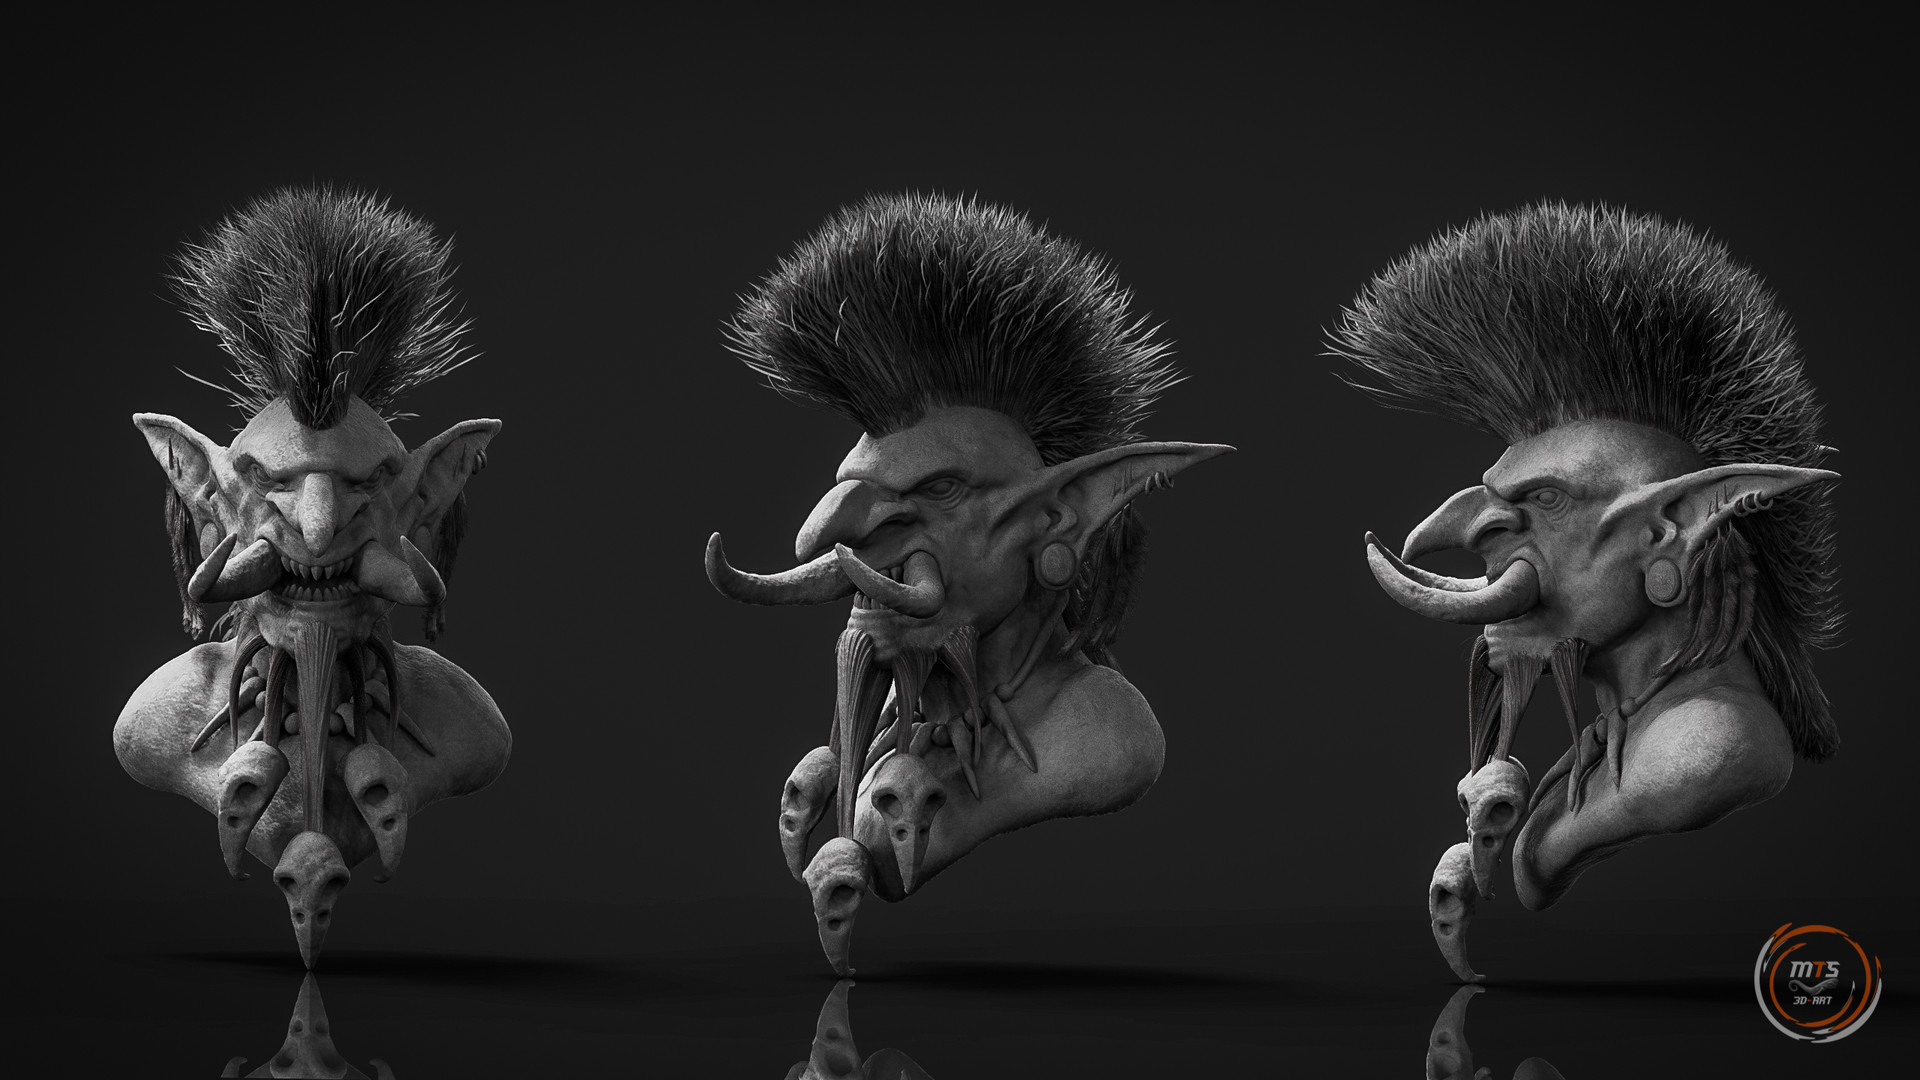 Matias toloza troll2